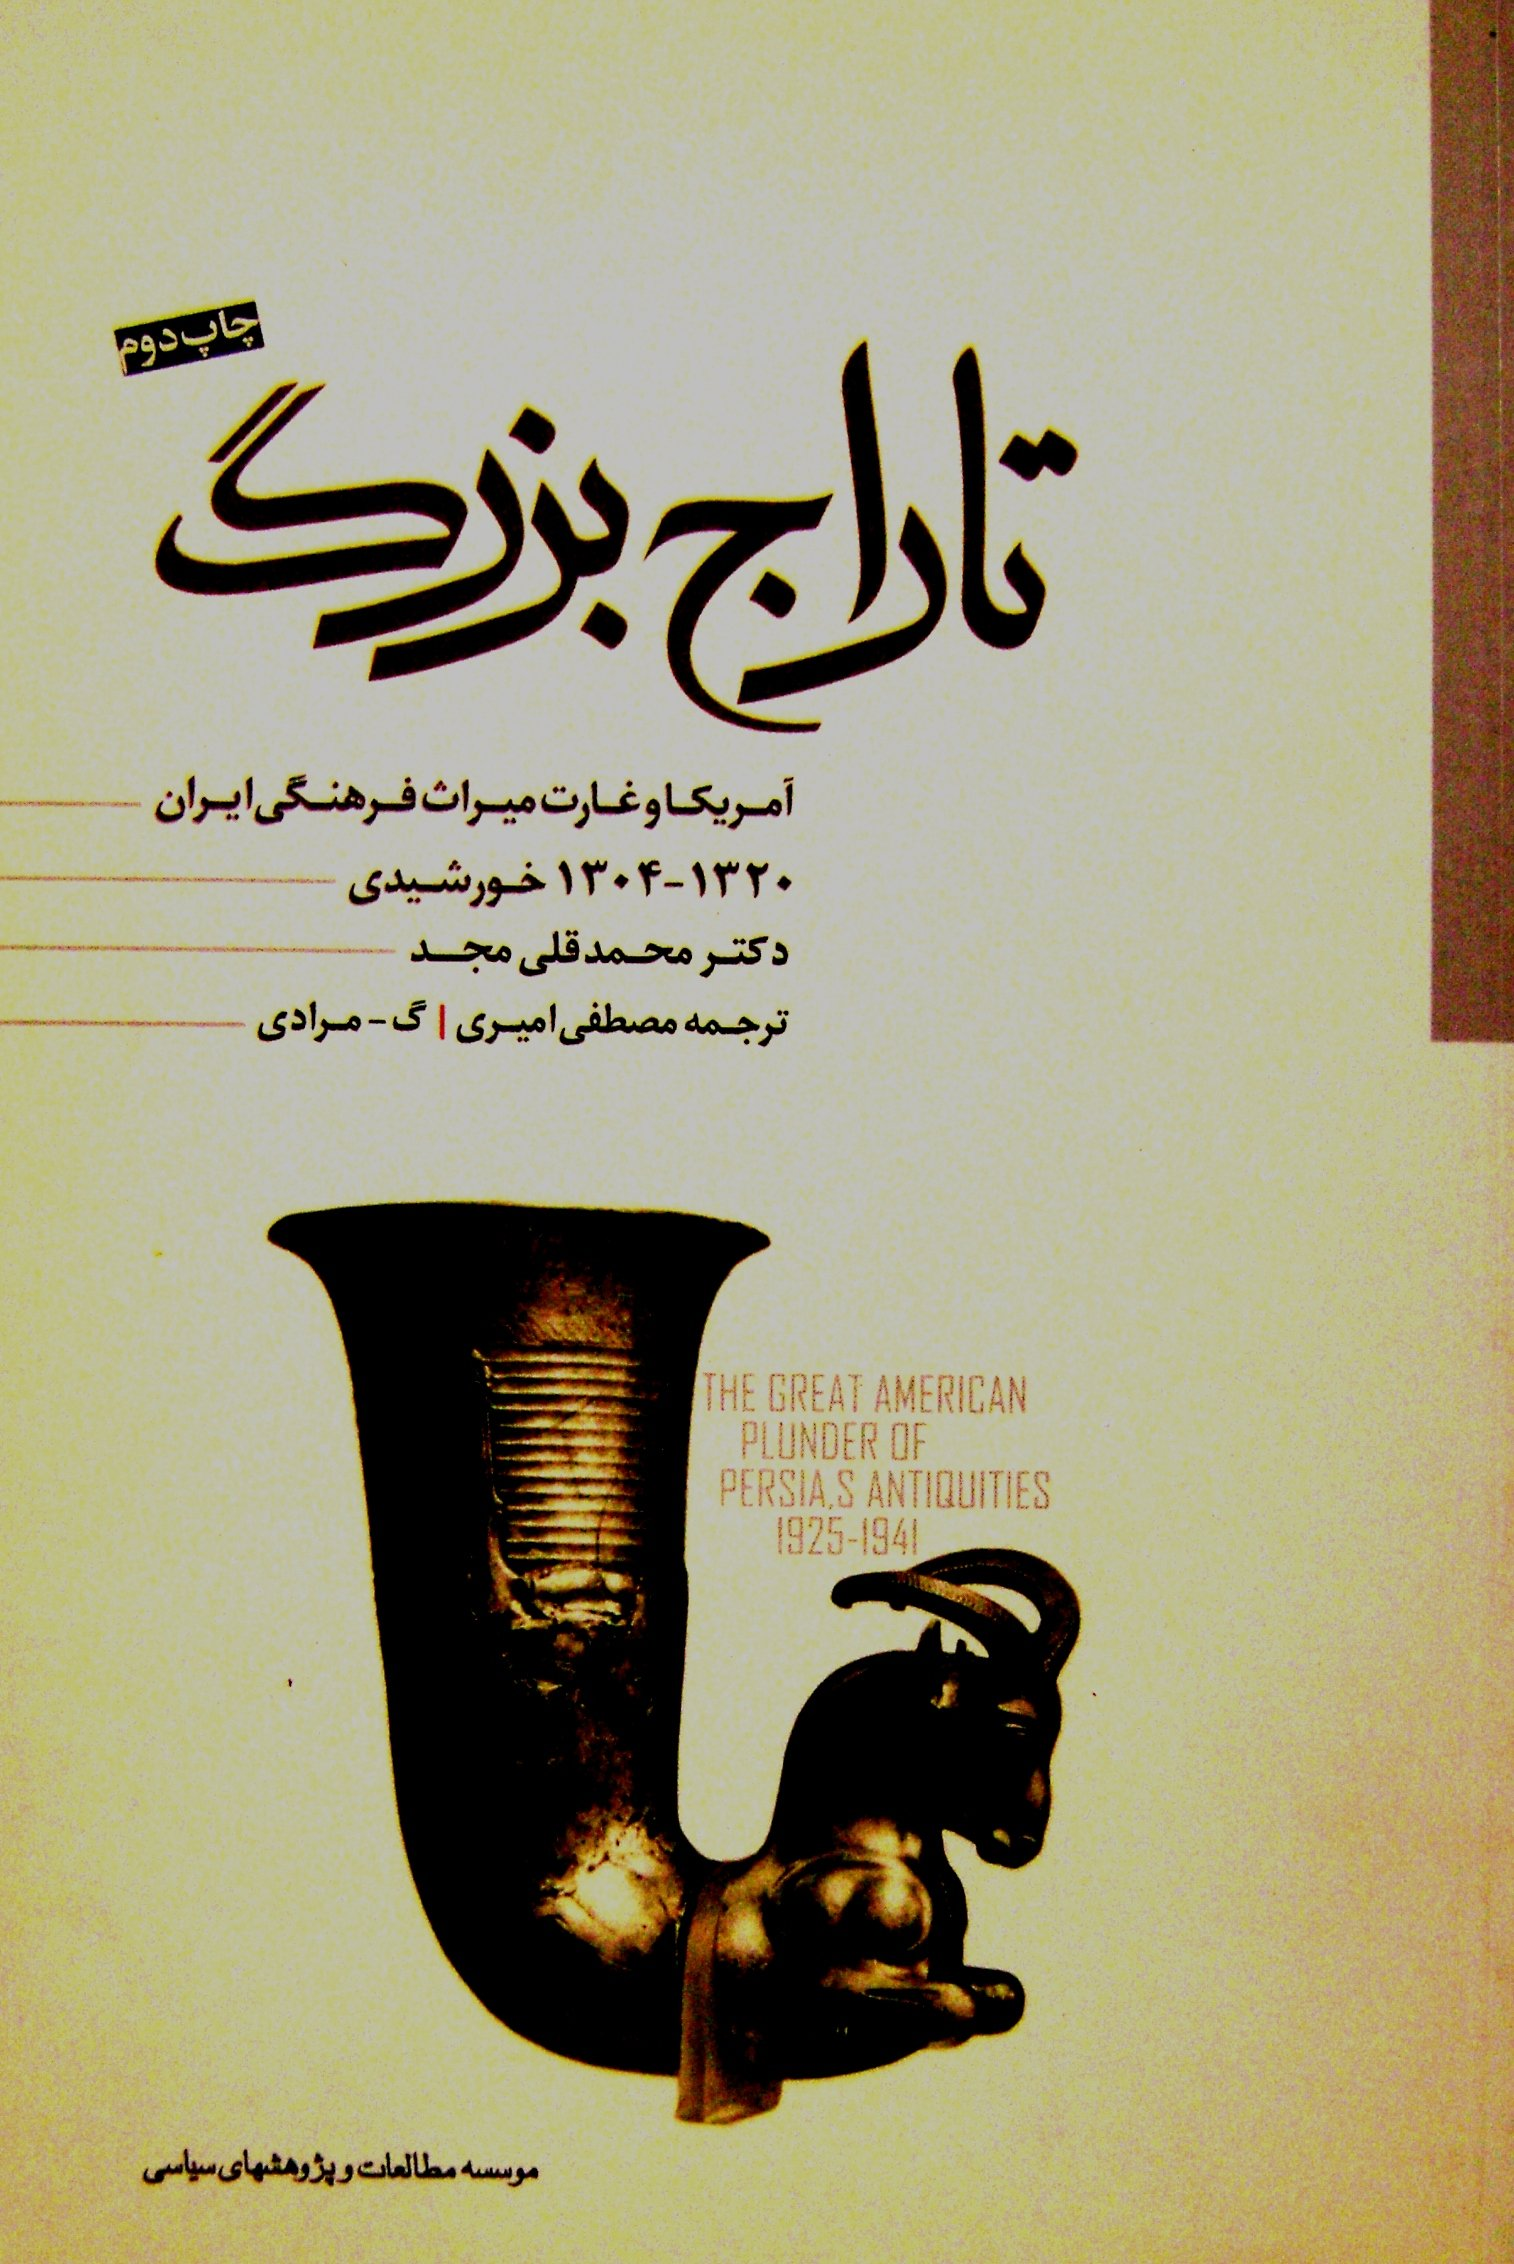 "Taraje Bozorg; Amrica va Gharate Mirathe Farhangiye Iran 1304-1320. ""The Great American Plunder of Persia's Antiquities 1925-1941"" pdf"